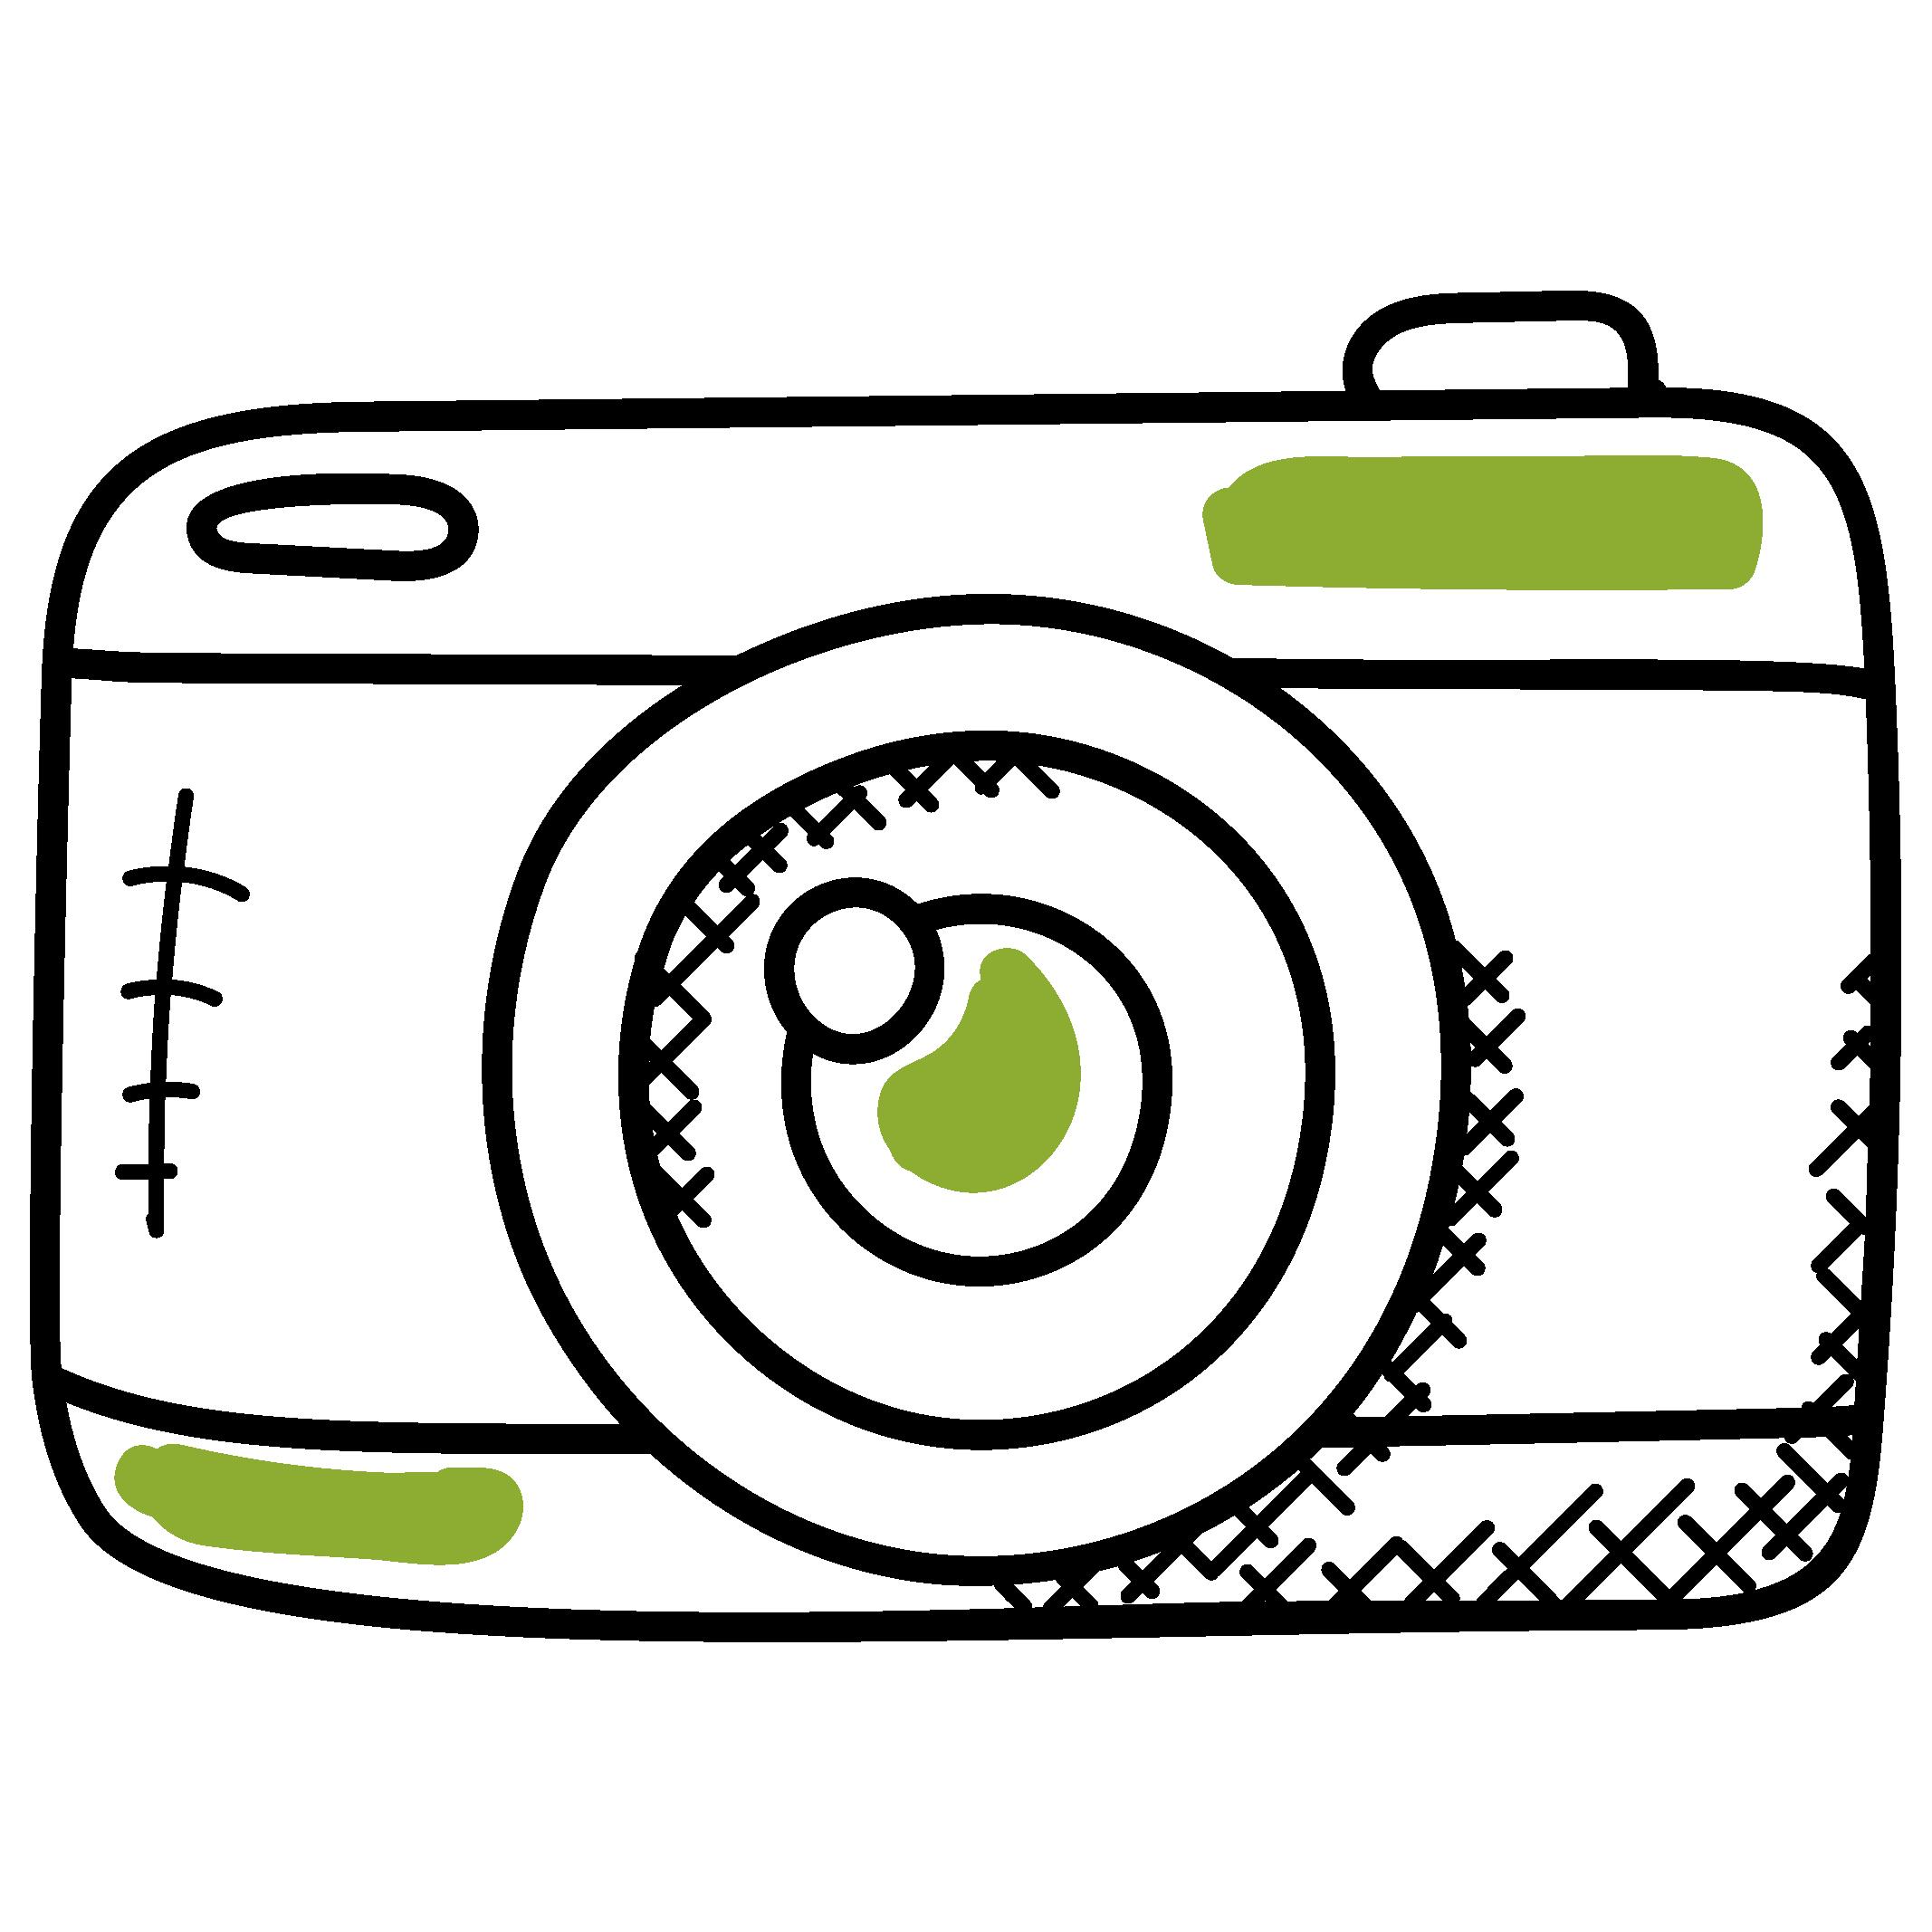 Gallery or photos